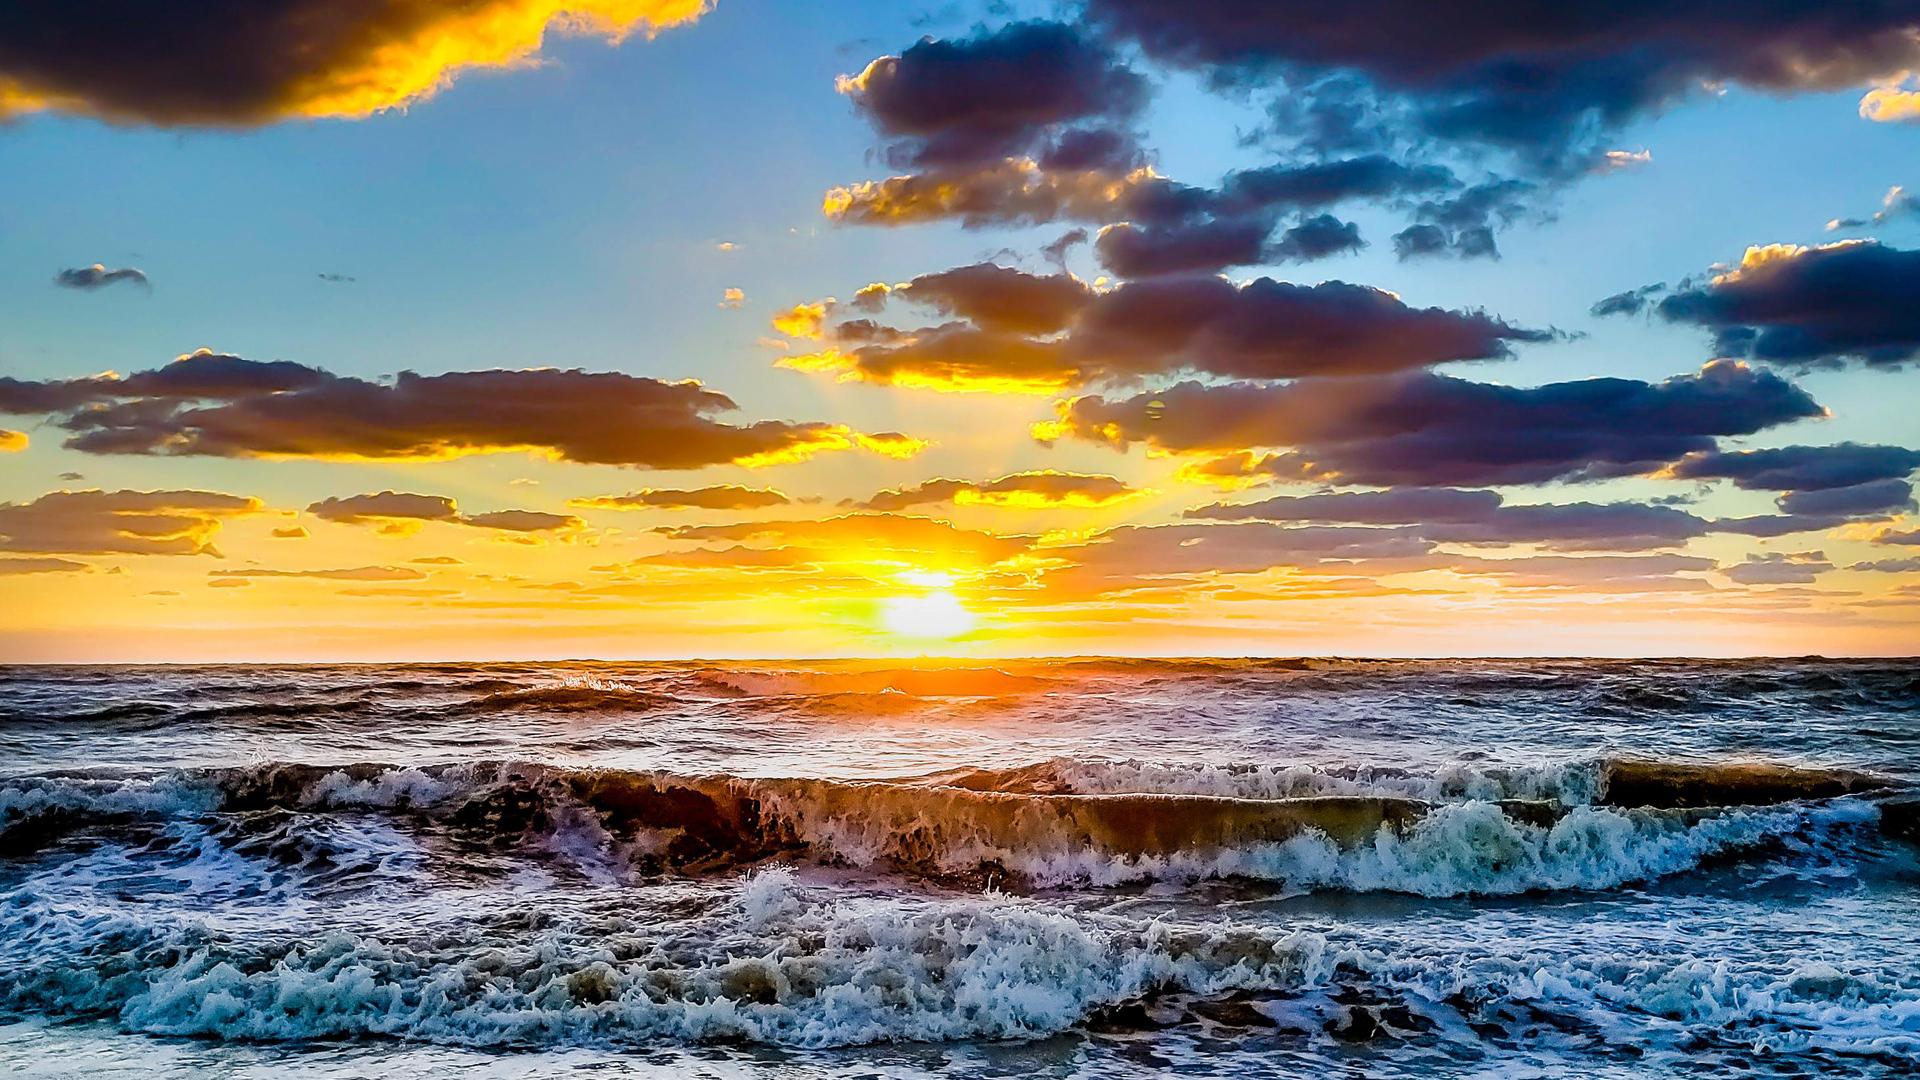 1920x1080 Beach Sea Spain Winter Laptop Full HD 1080P HD ...